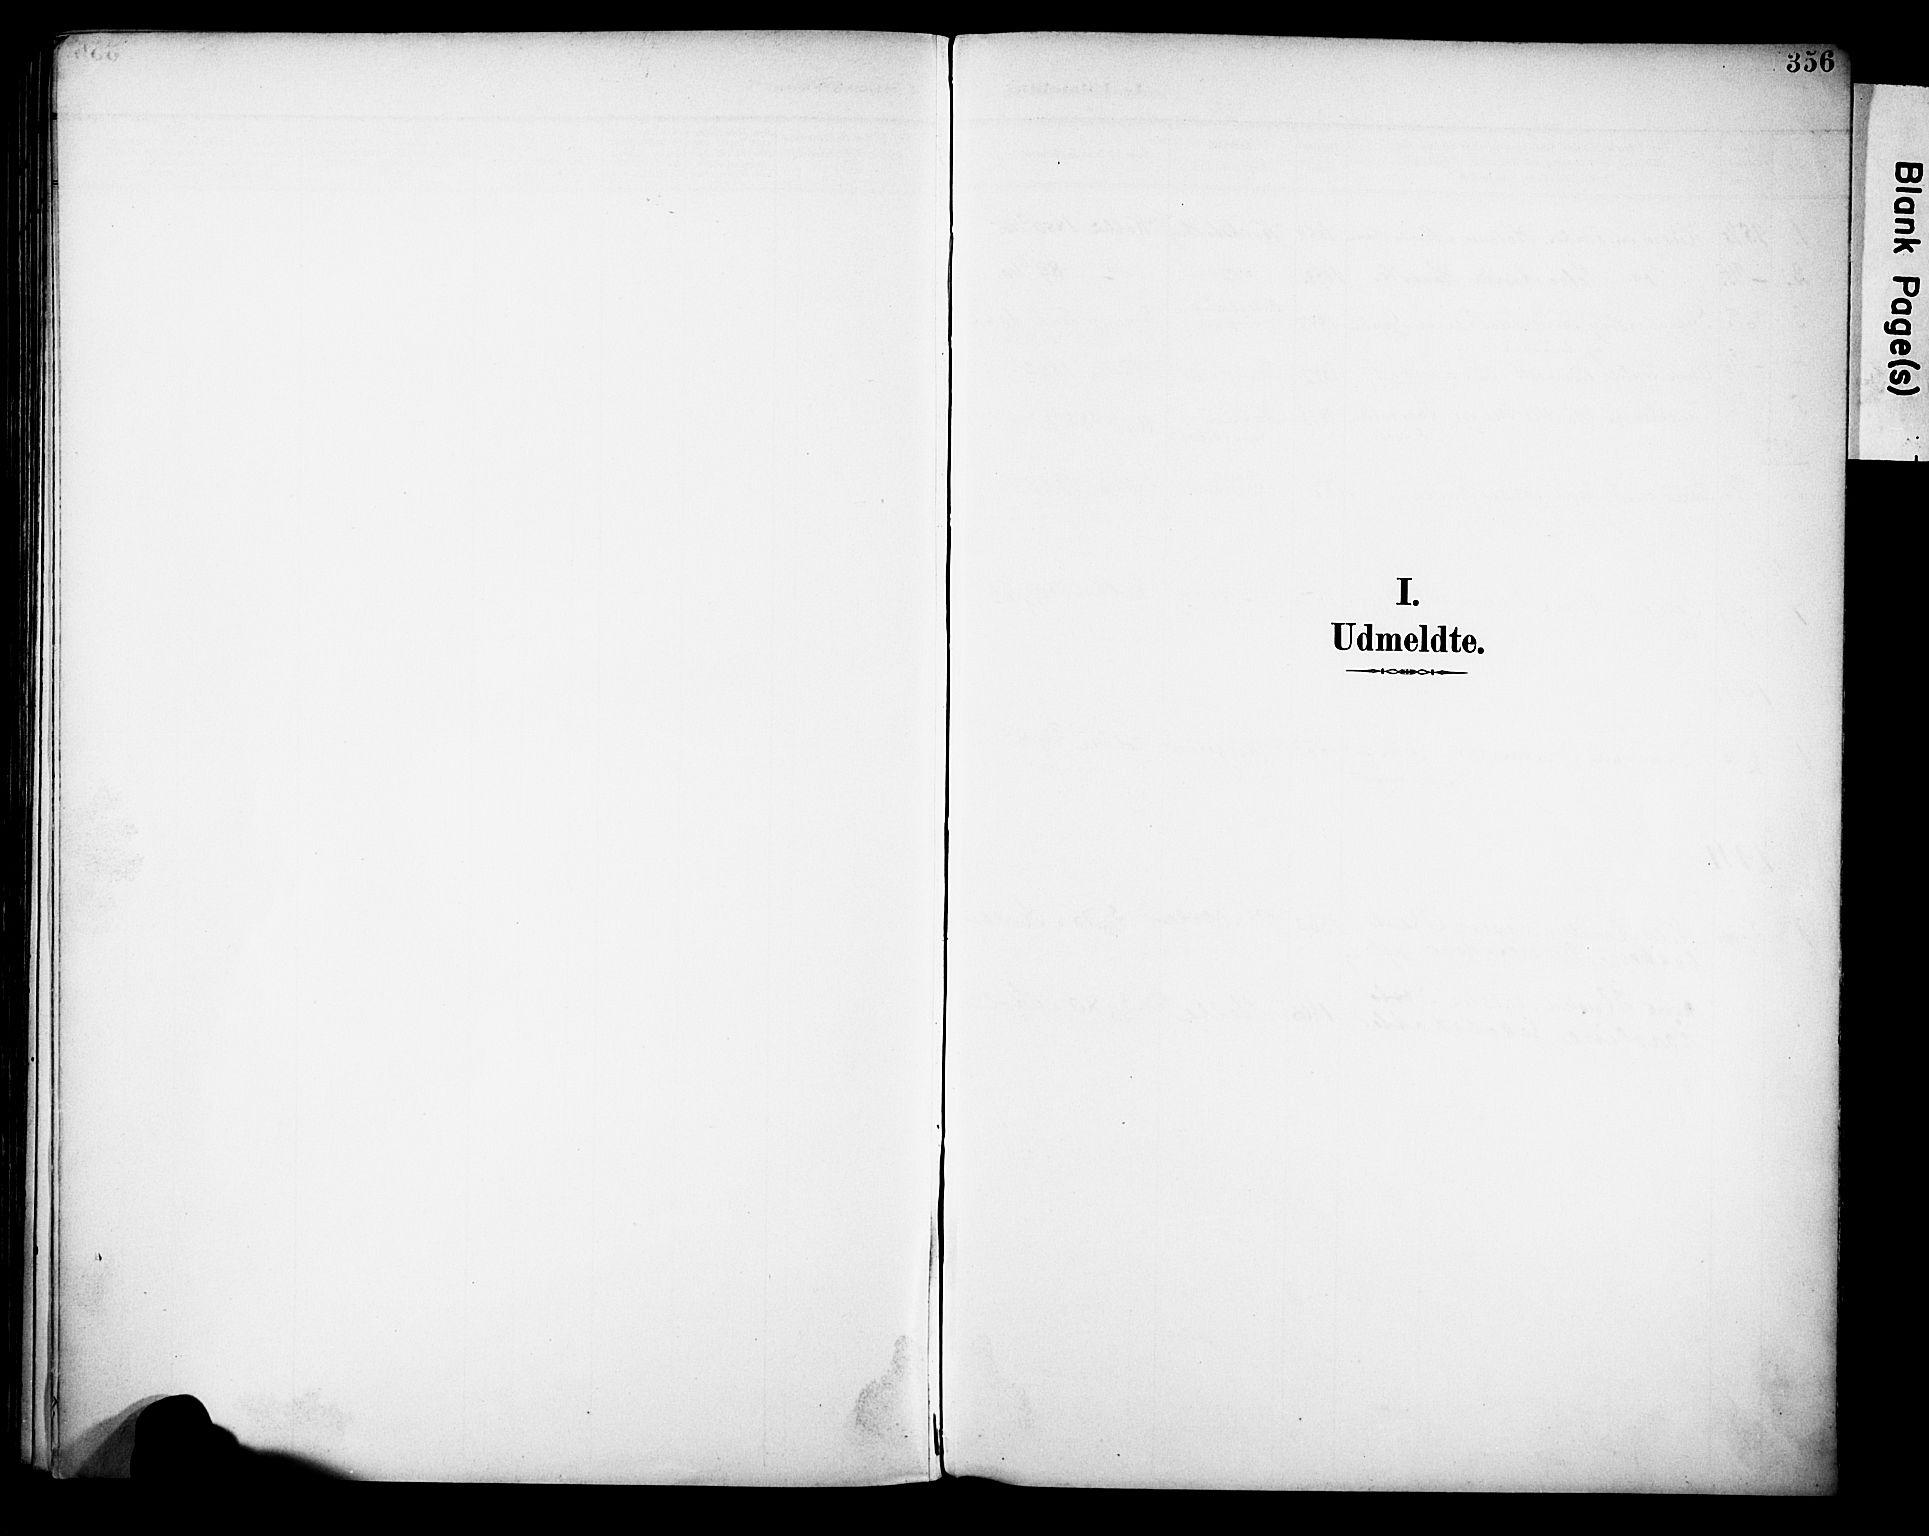 SAH, Vestre Toten prestekontor, H/Ha/Haa/L0013: Ministerialbok nr. 13, 1895-1911, s. 356